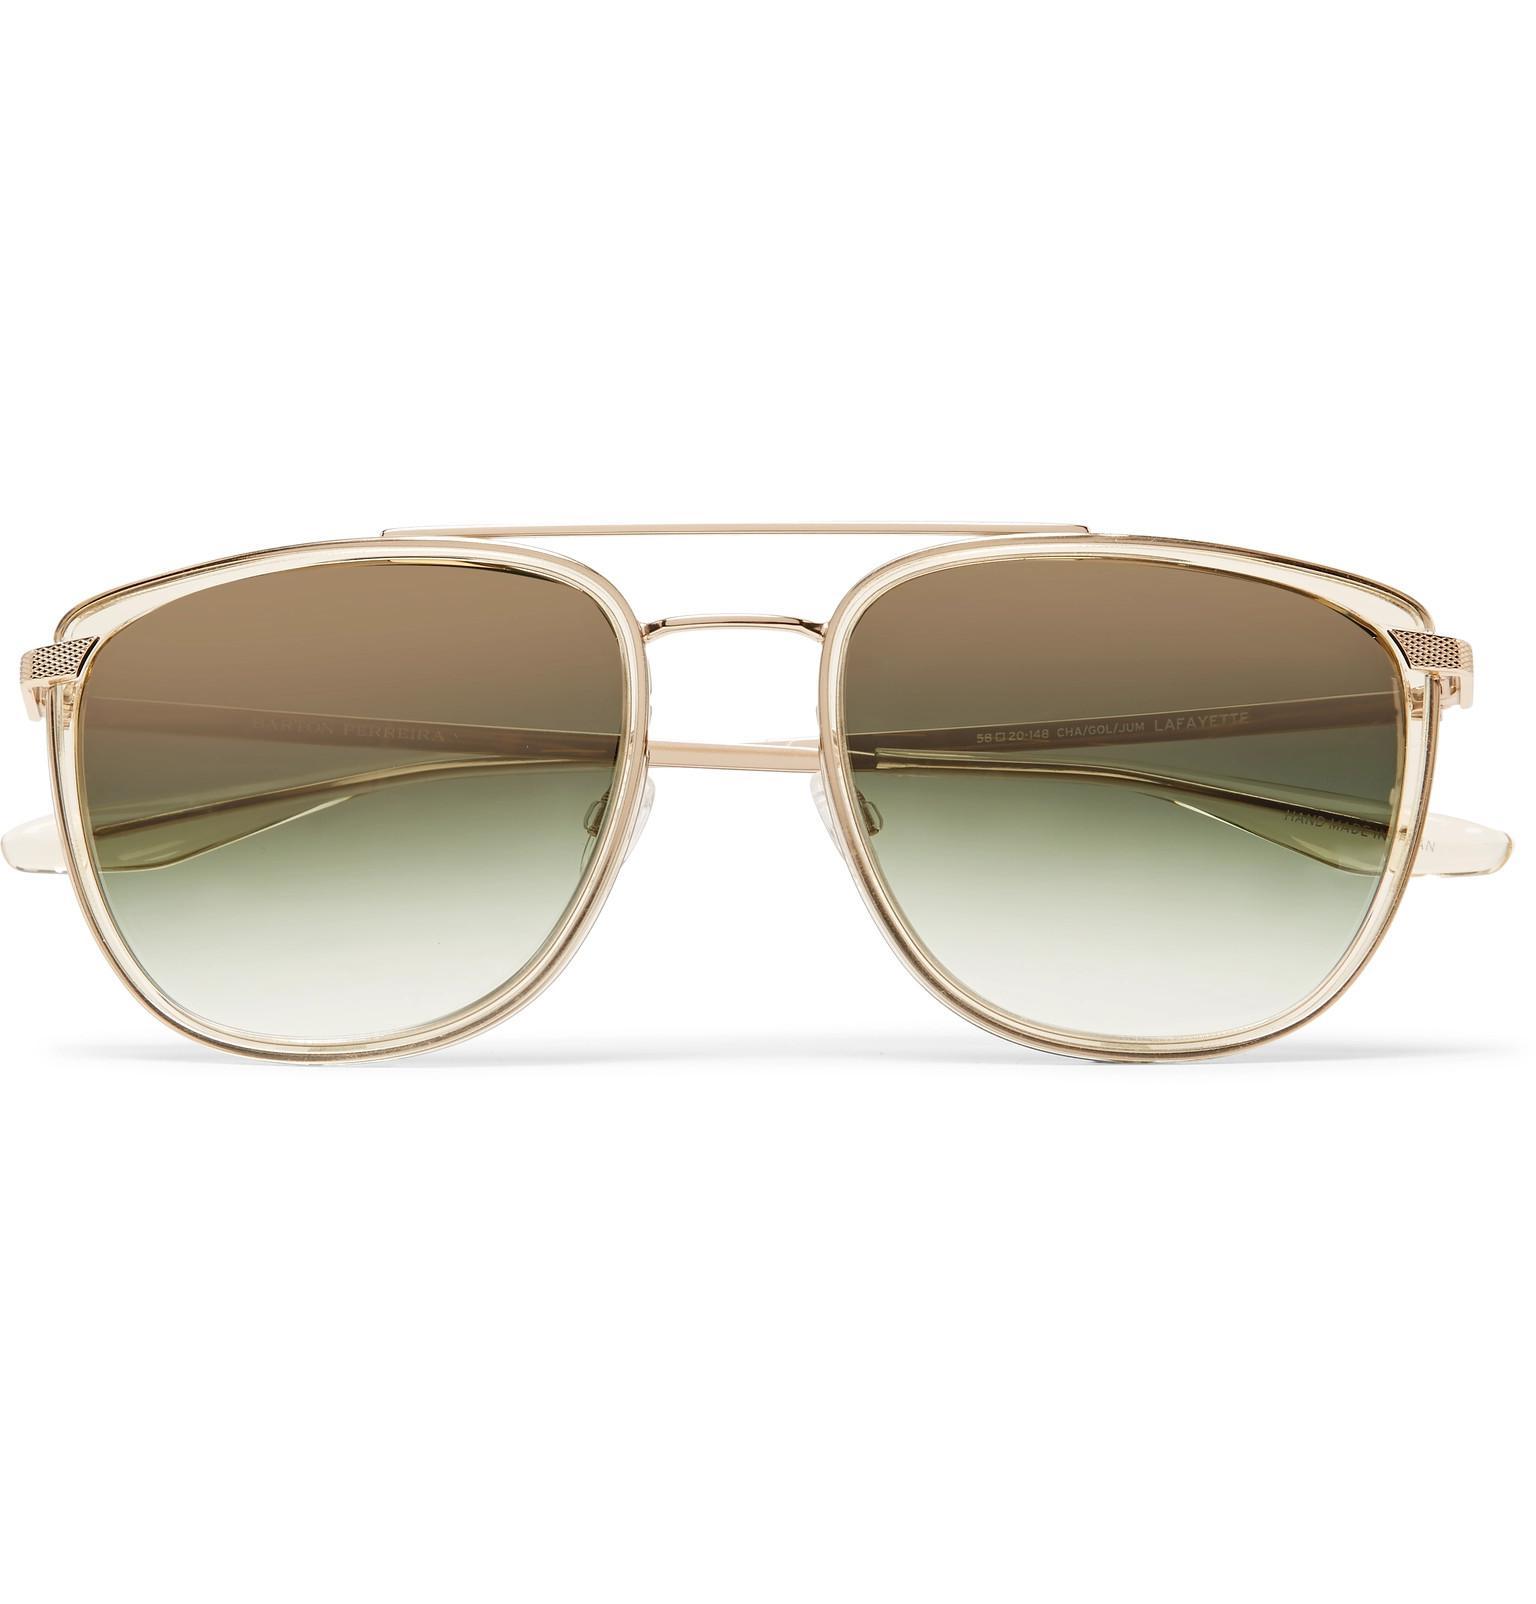 Lafayette Aviator-style Tortoiseshell Acetate And Gold-tone Sunglasses Barton Perreira sWJhxjO